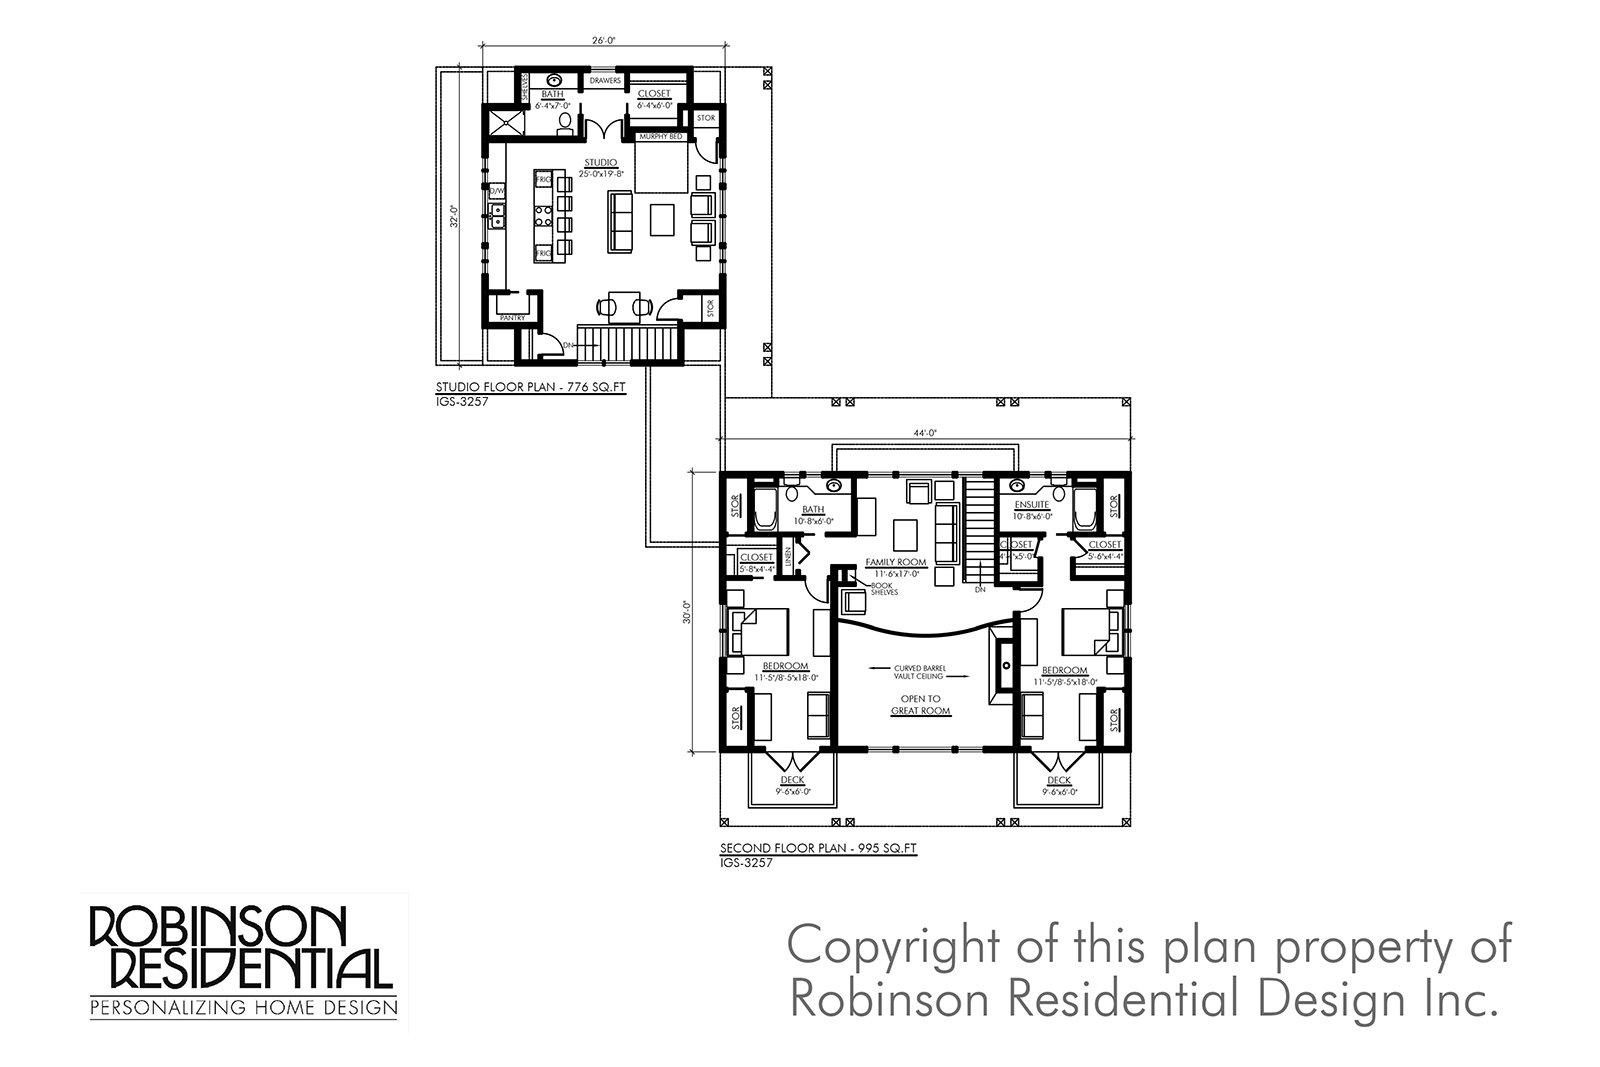 Igs 3257   craftsman home plan   02 second floor plan